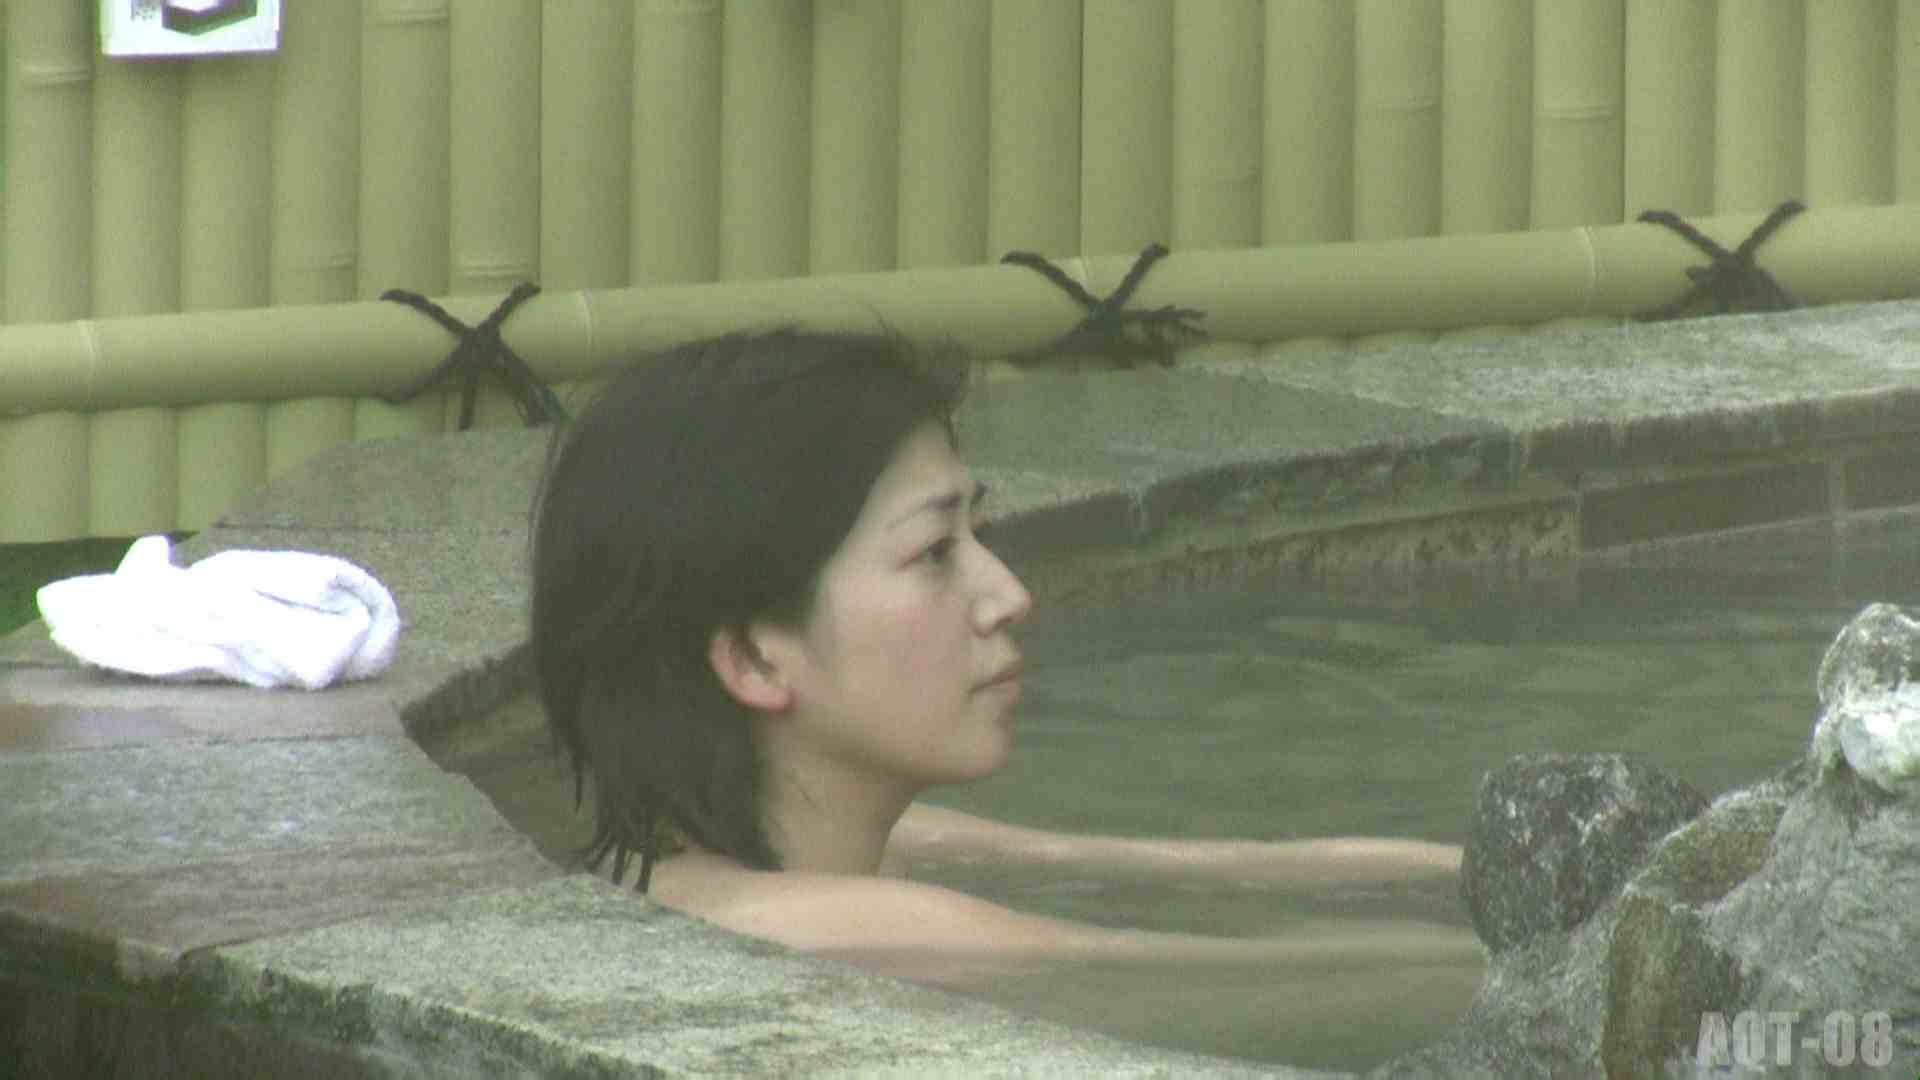 Aquaな露天風呂Vol.776 盗撮 エロ無料画像 108画像 101